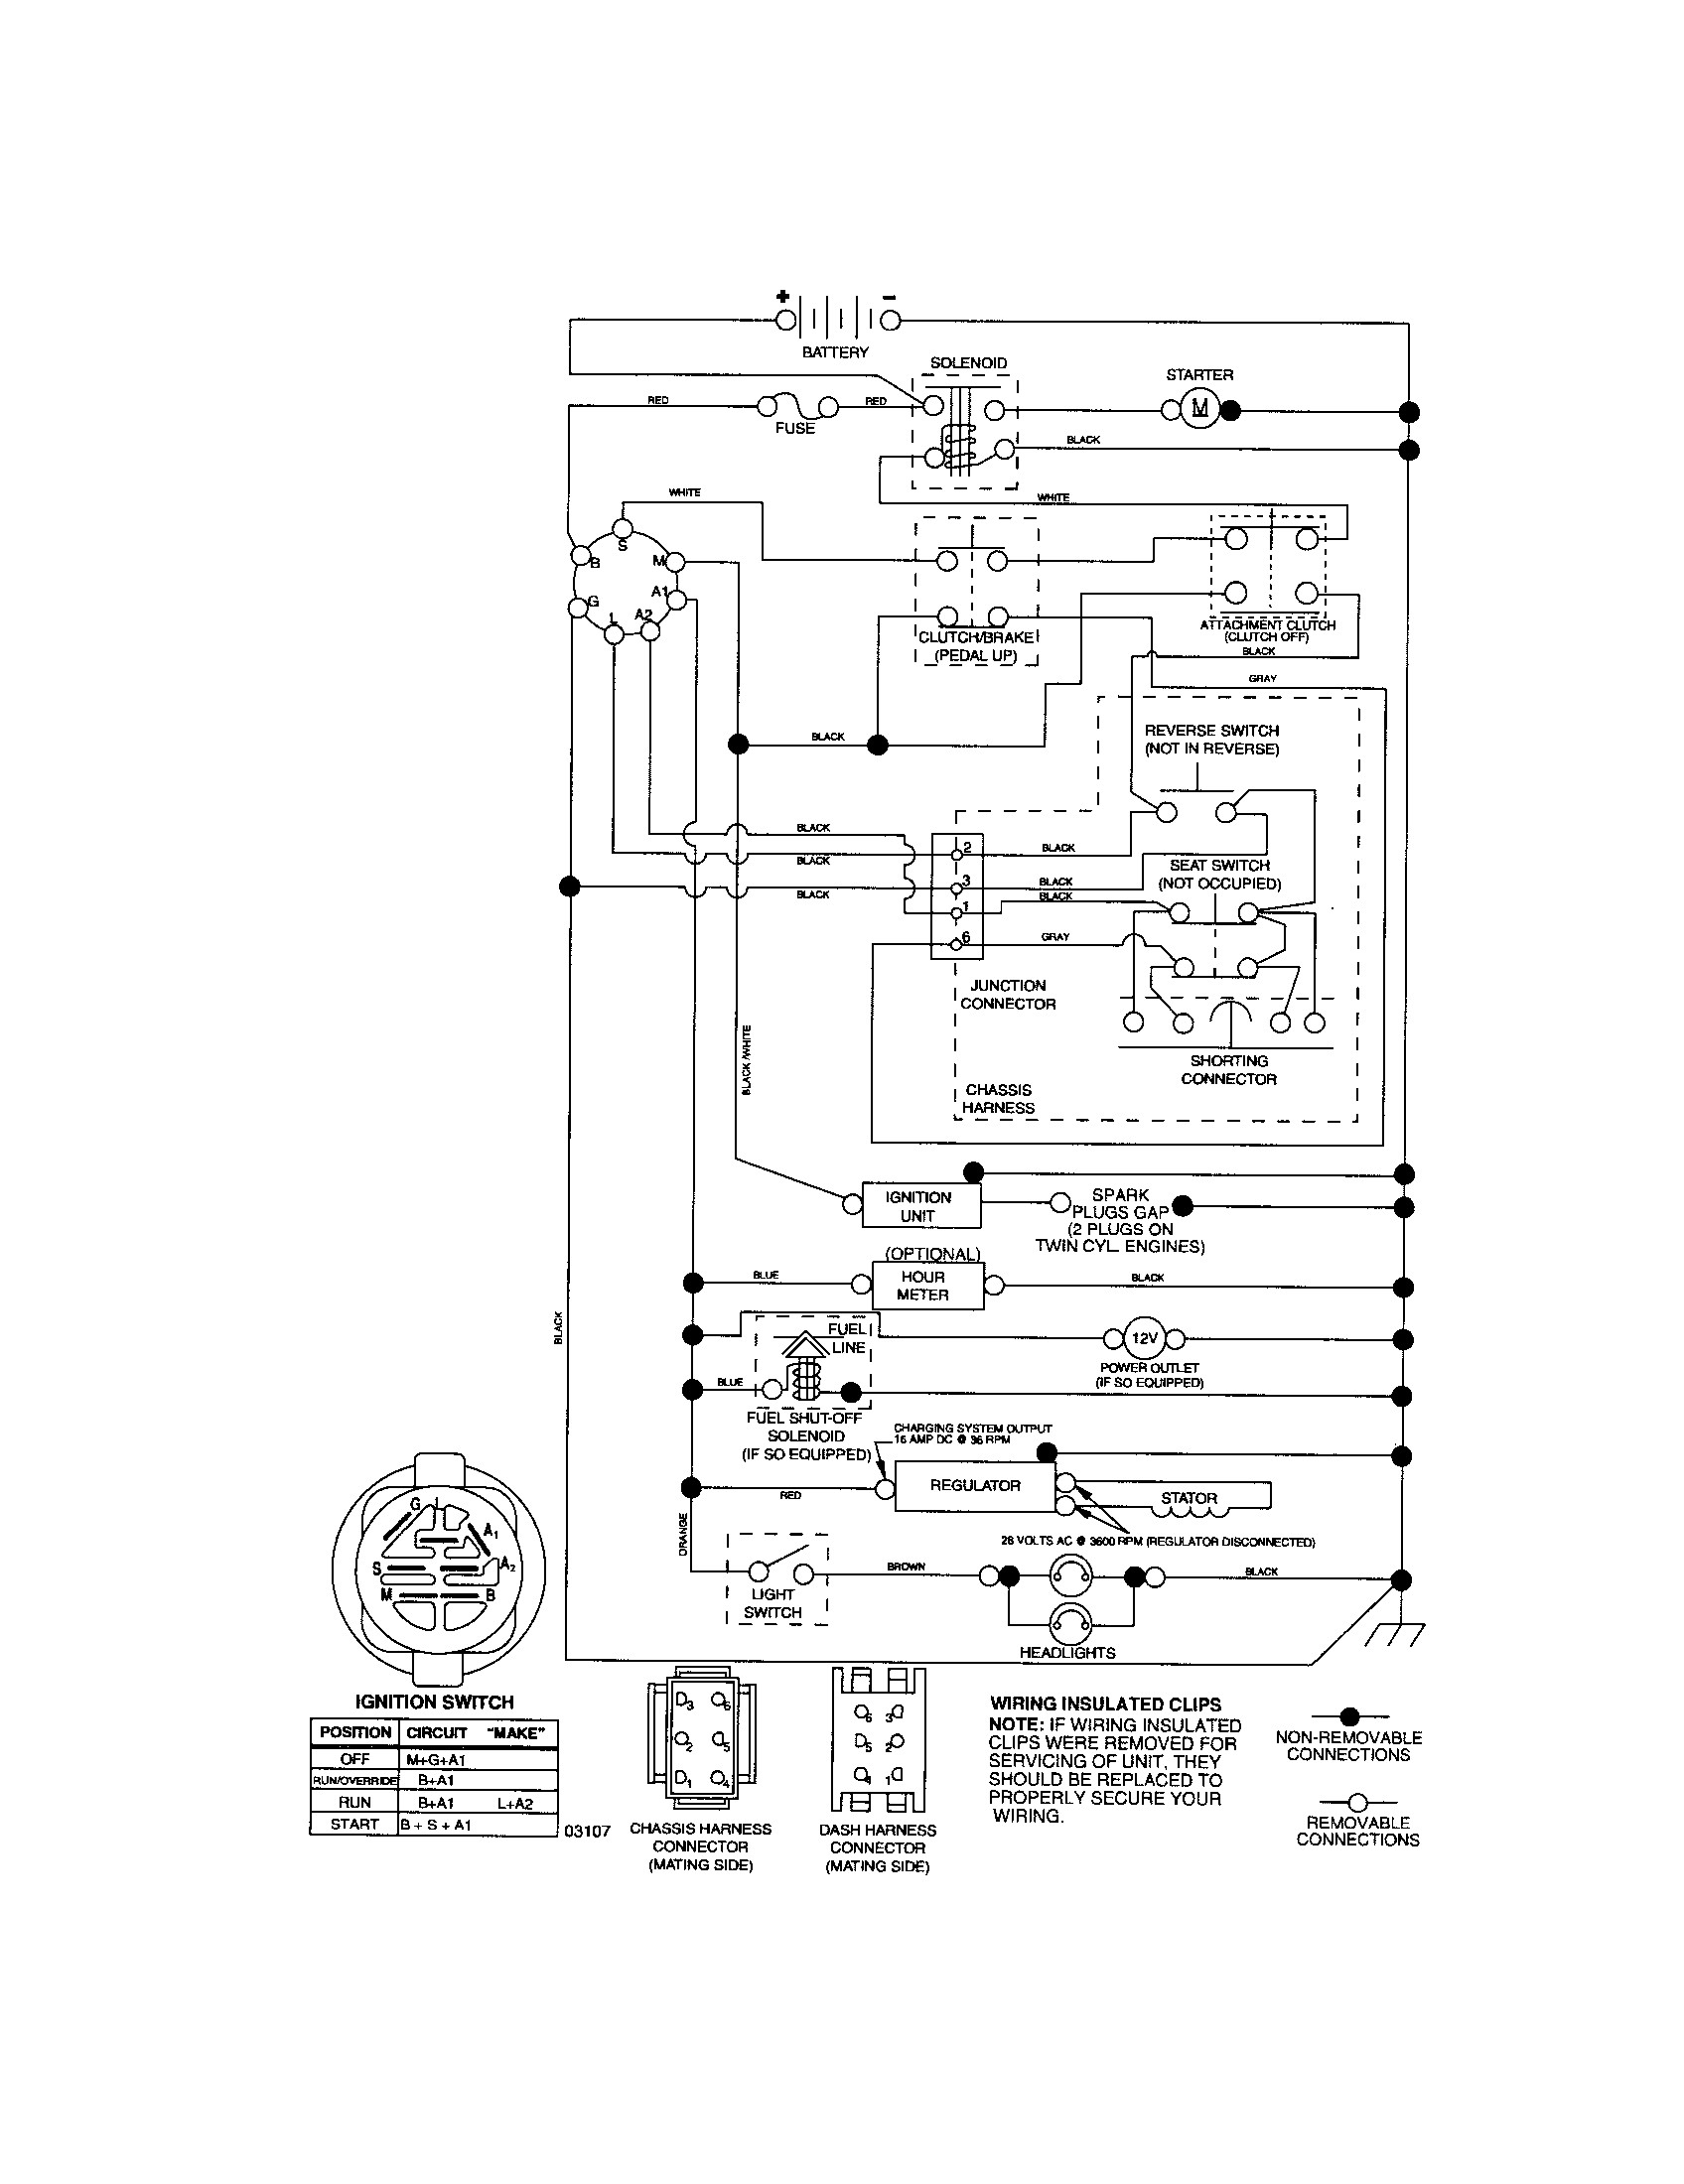 wiring diagram for a craftsman riding mower funky craftsman mower rh detoxicrecenze com wiring diagram for 97 blazer wiring diagram for 97 chevy 3500